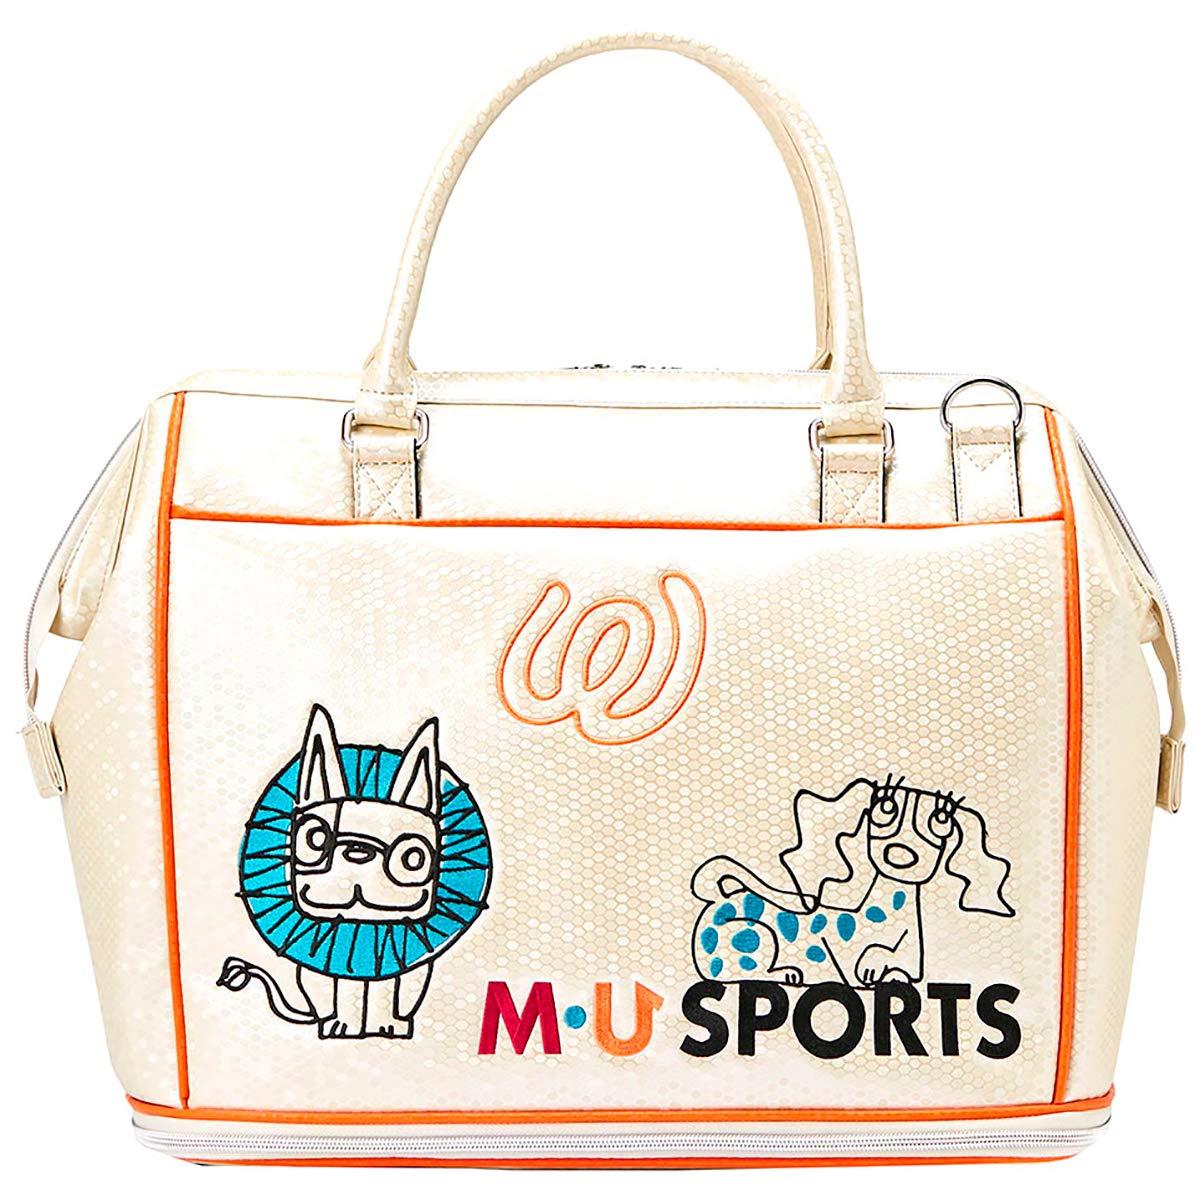 MU SPORTS(エム ユースポーツ) ボストンバッグ 2019SSシリーズ アニマル柄ボストン アイボリー 703P2200 アイボリー B07QS3SX34